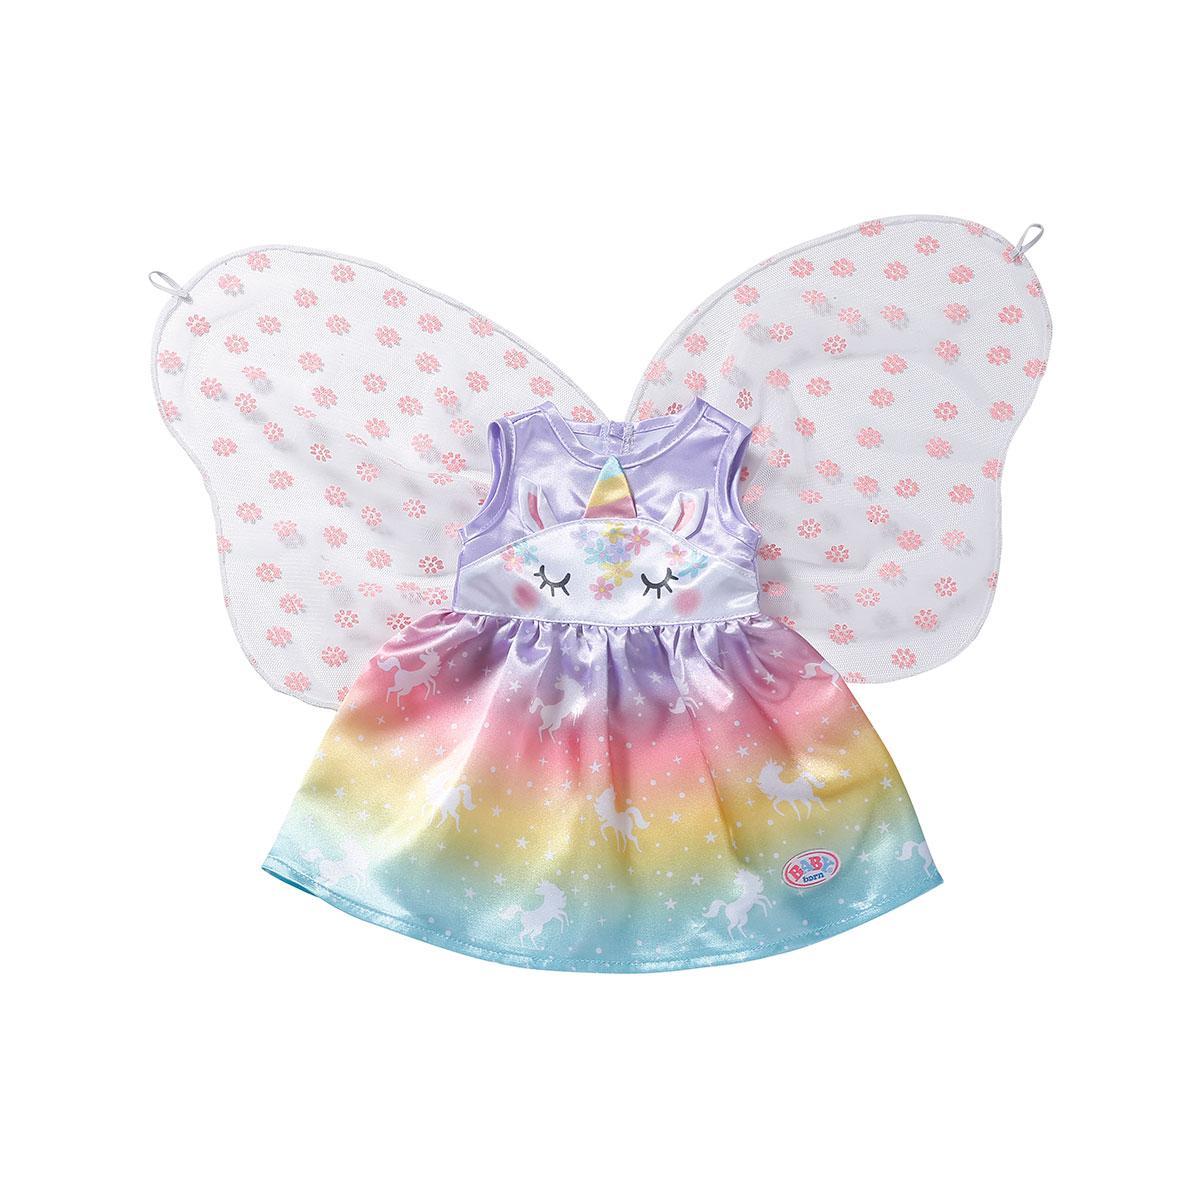 Одежда для куклы BABY BORN - СКАЗОЧНАЯ ФЕЯ, 829301